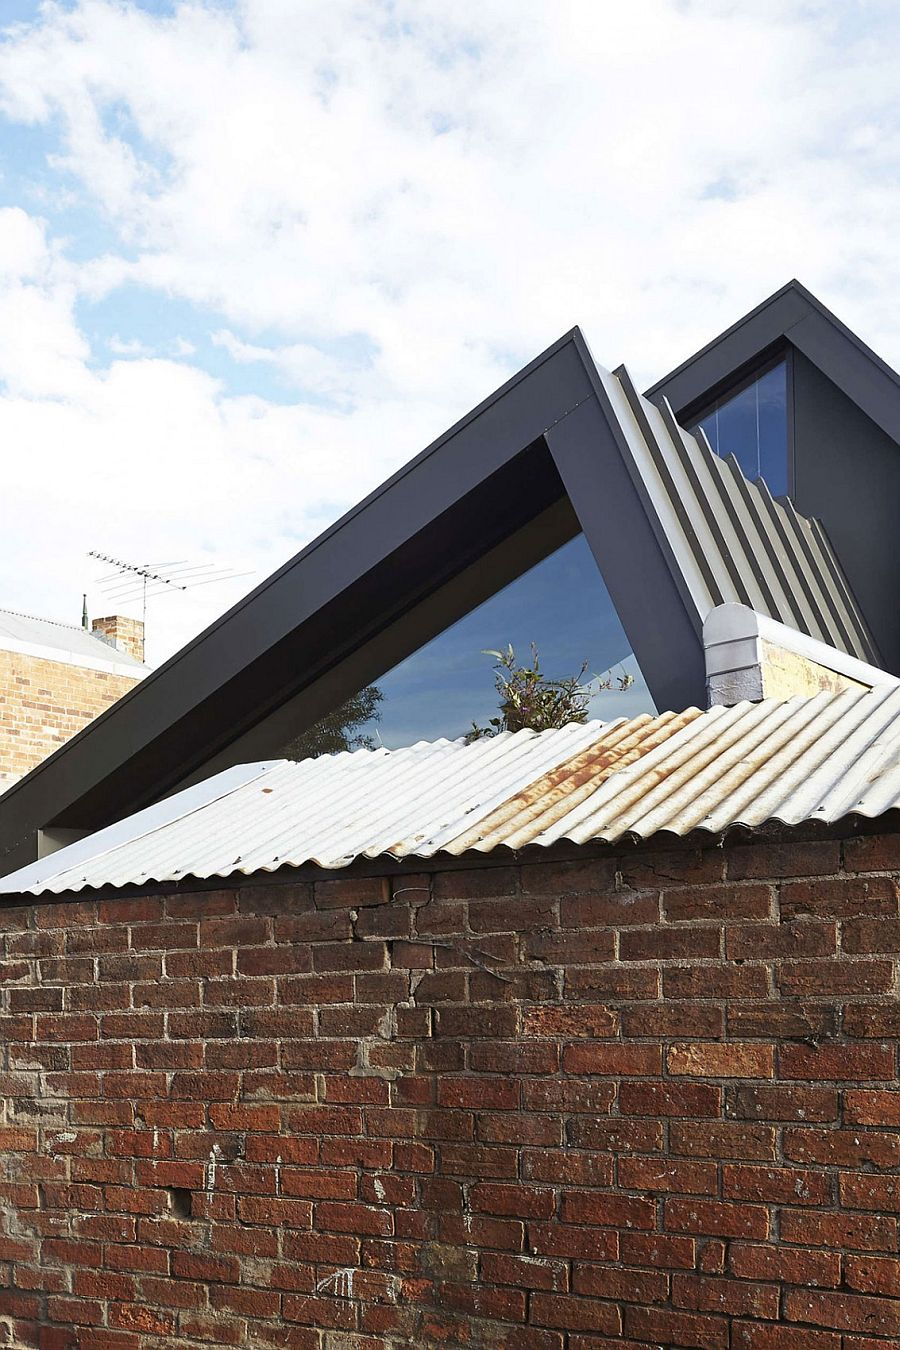 Brick exterior of heritage Victorian terrace house in Australia